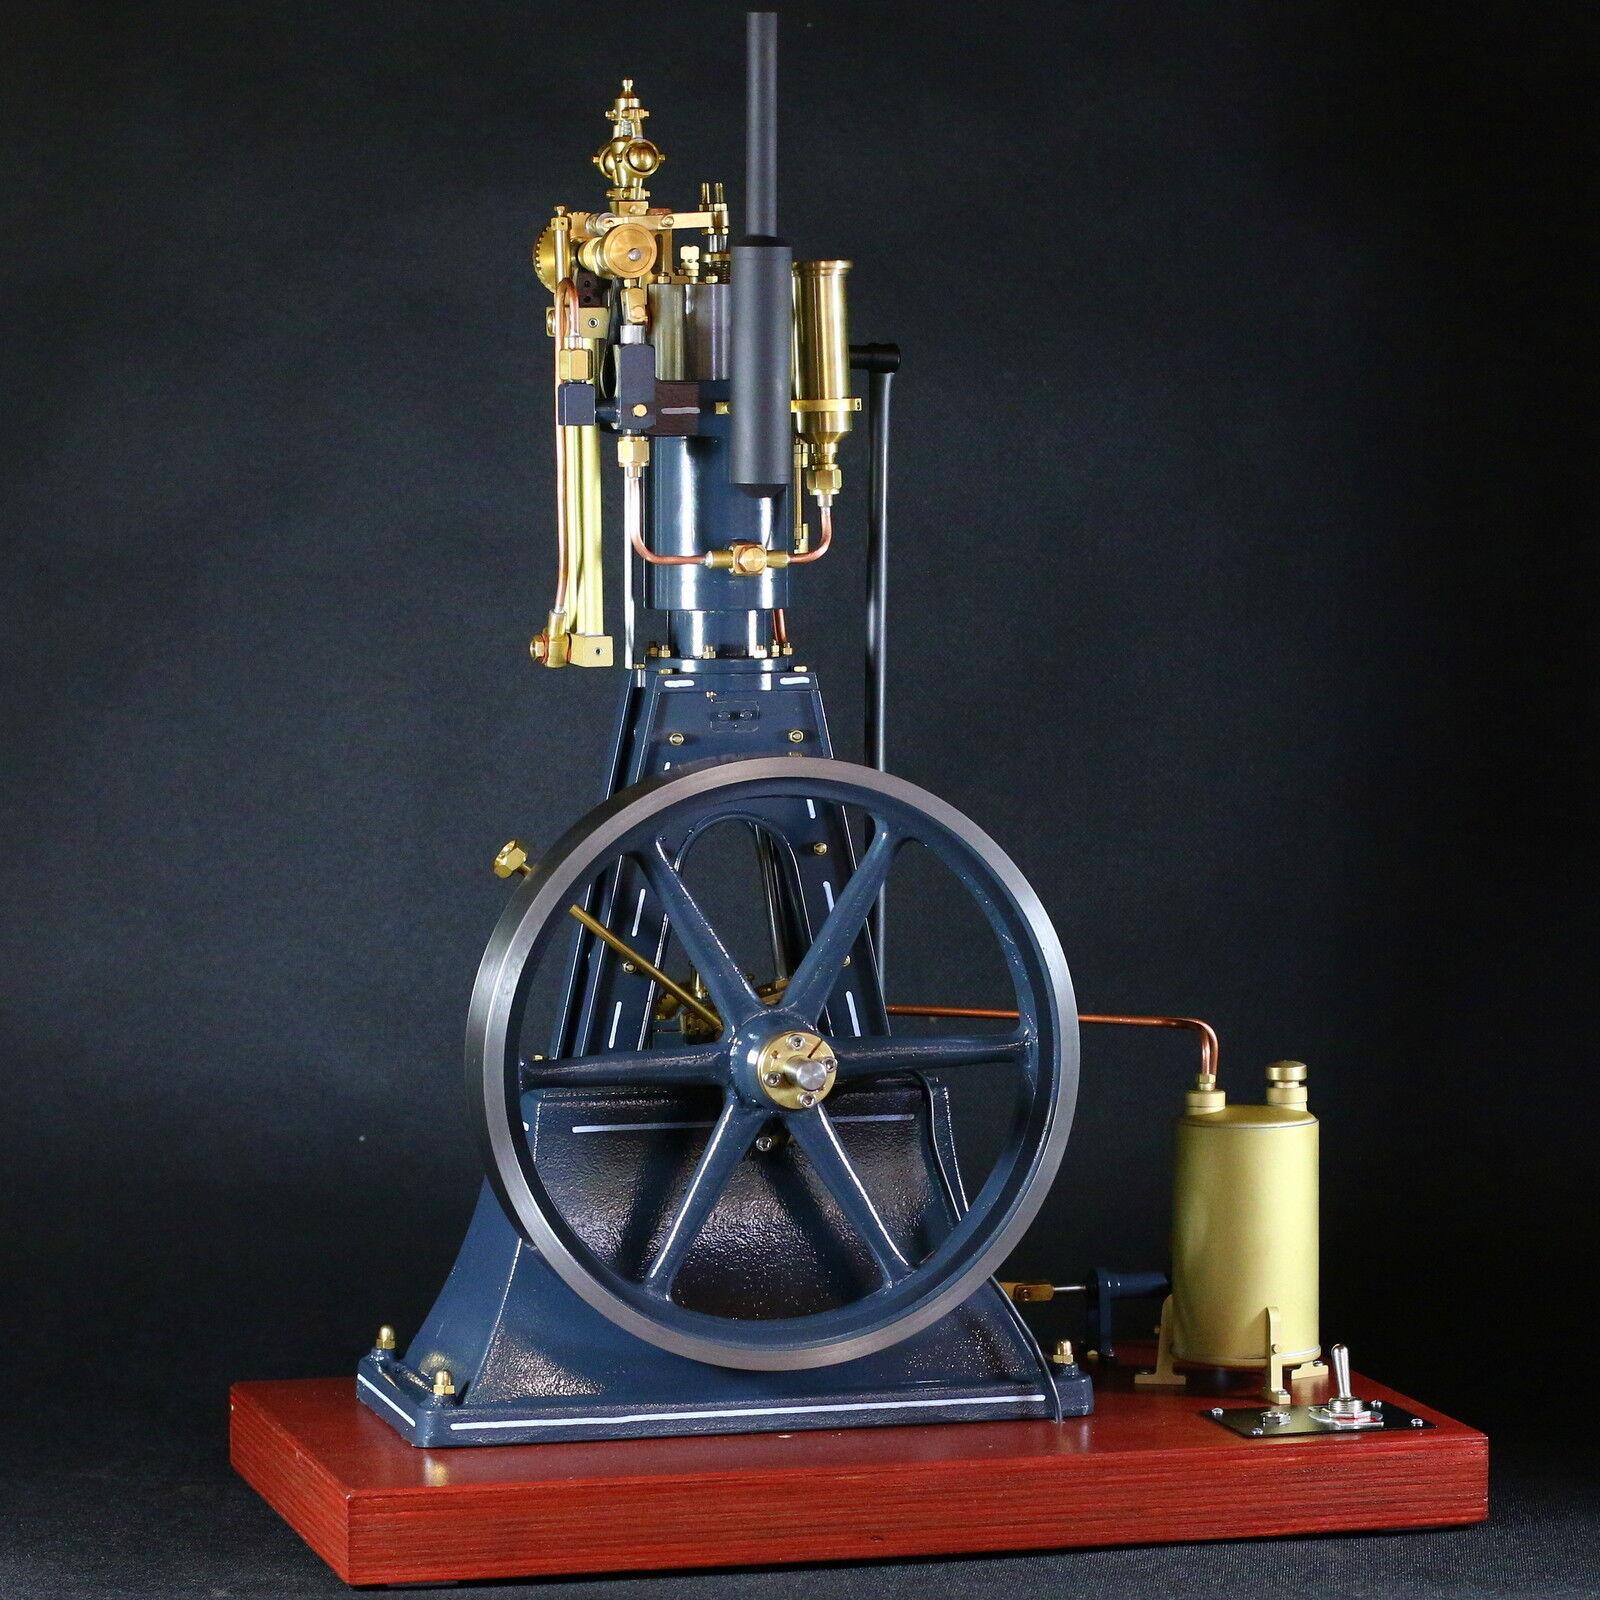 Grünikaler Verbrennungsmotor  Jonas  Materialbausatz Stationärmotor    | Primäre Qualität  f8bad6